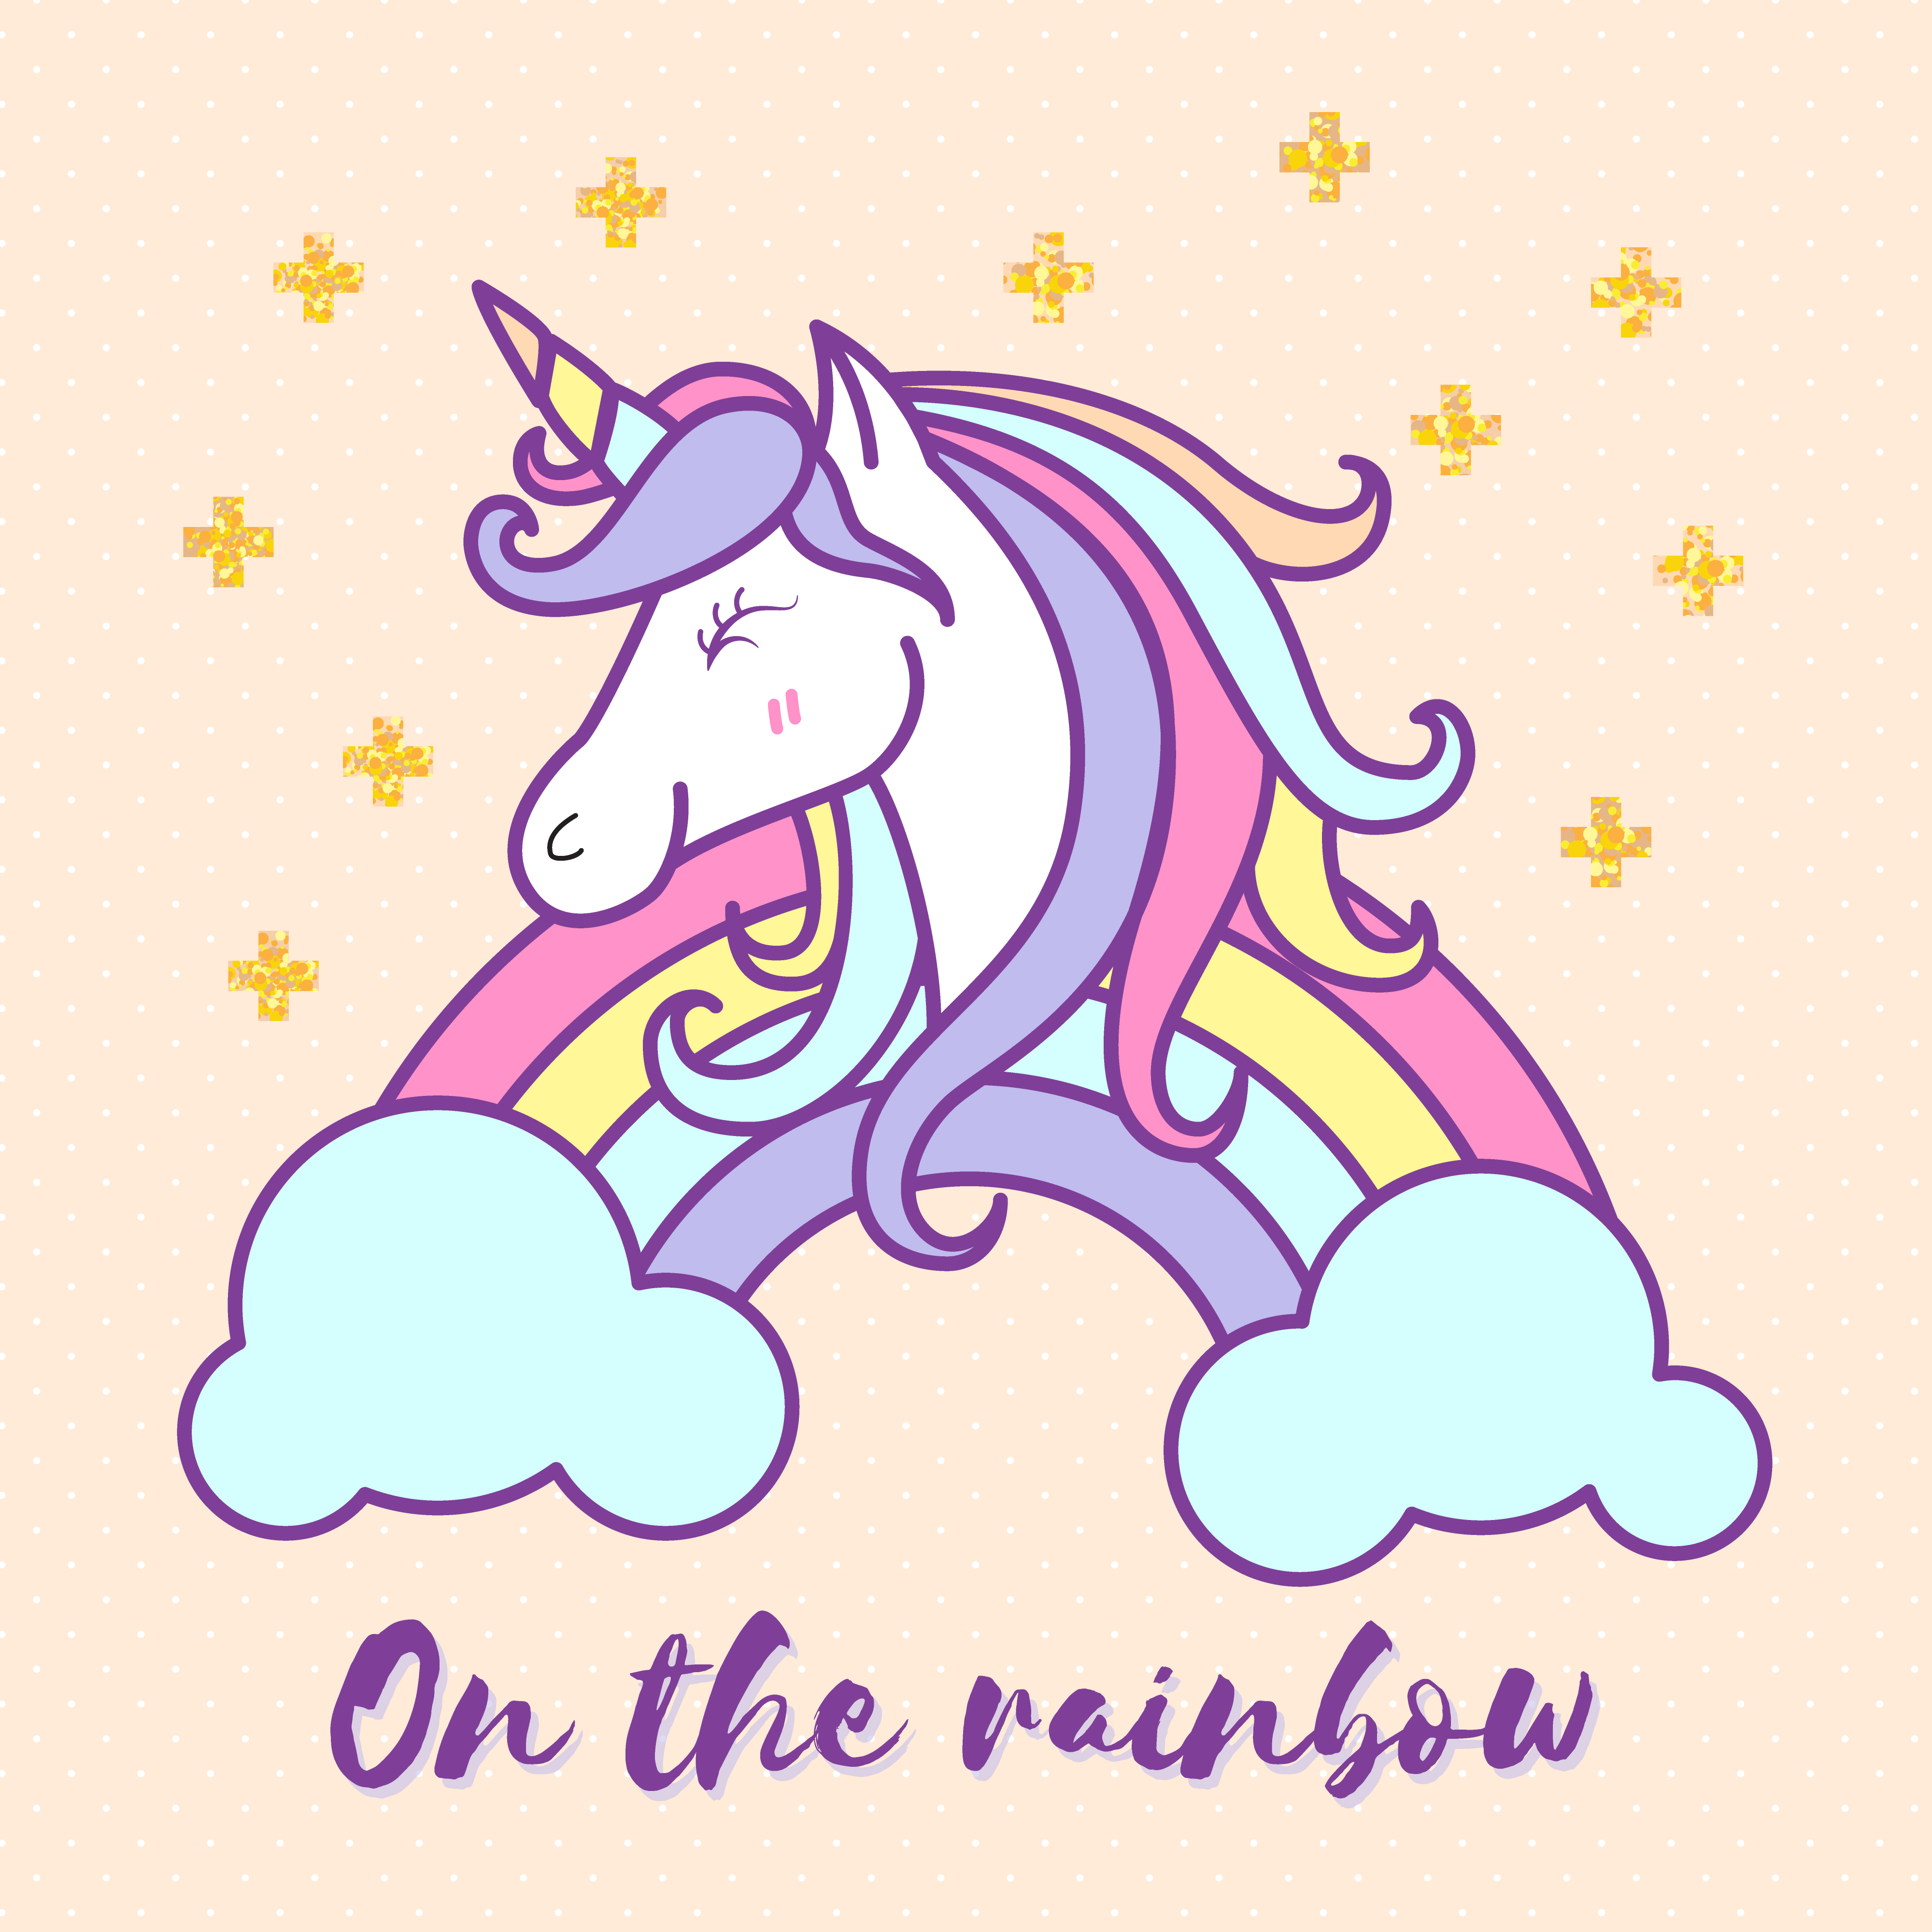 cute unicorn cartoon character illustration design